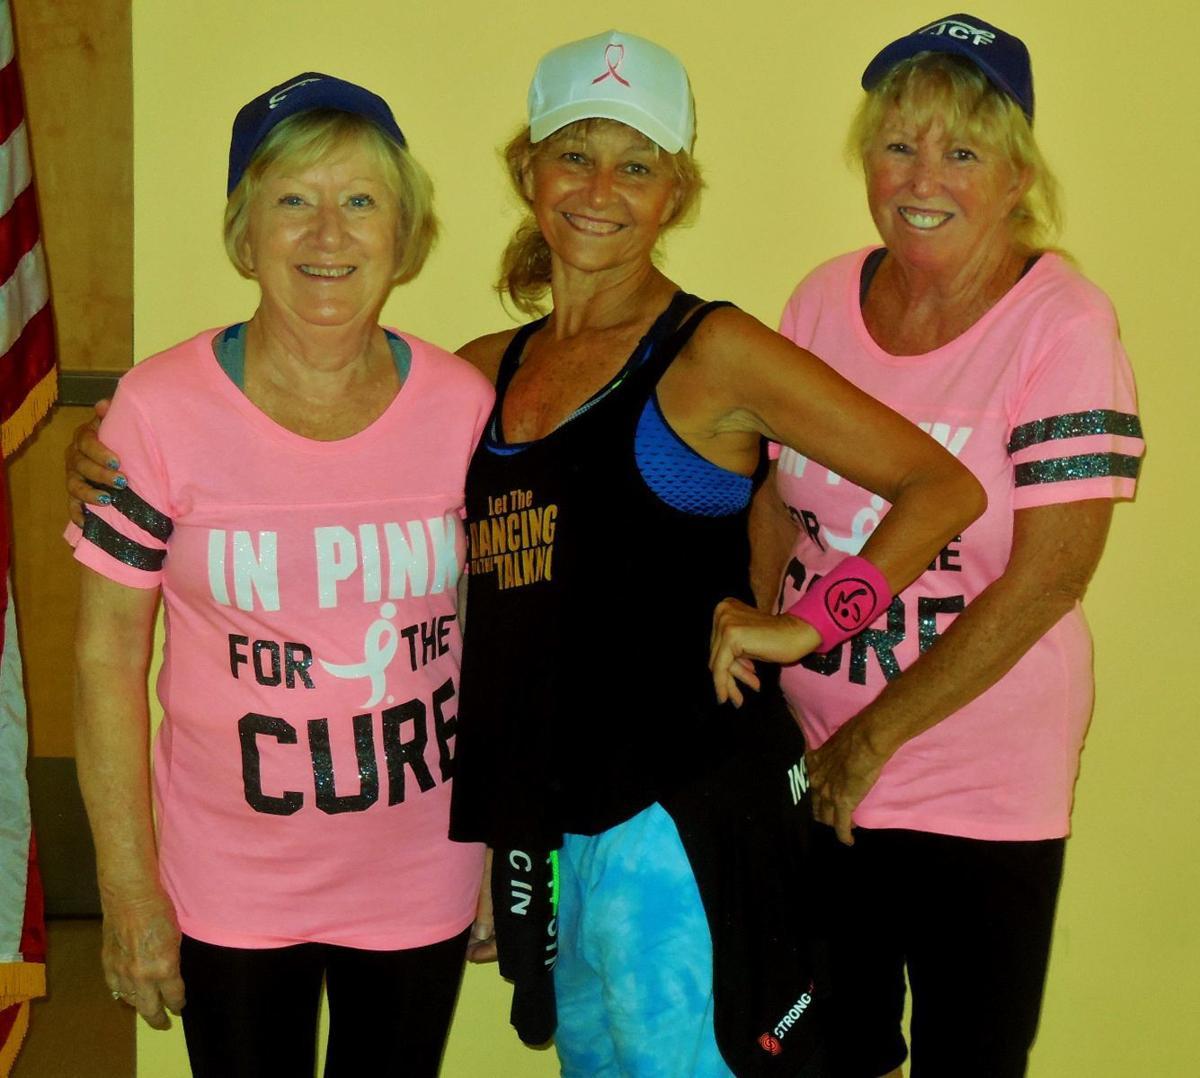 7d96a2d86 South Jersey Cancer Fund to hold Zumbathon Sept. 30 in Brigantine ...